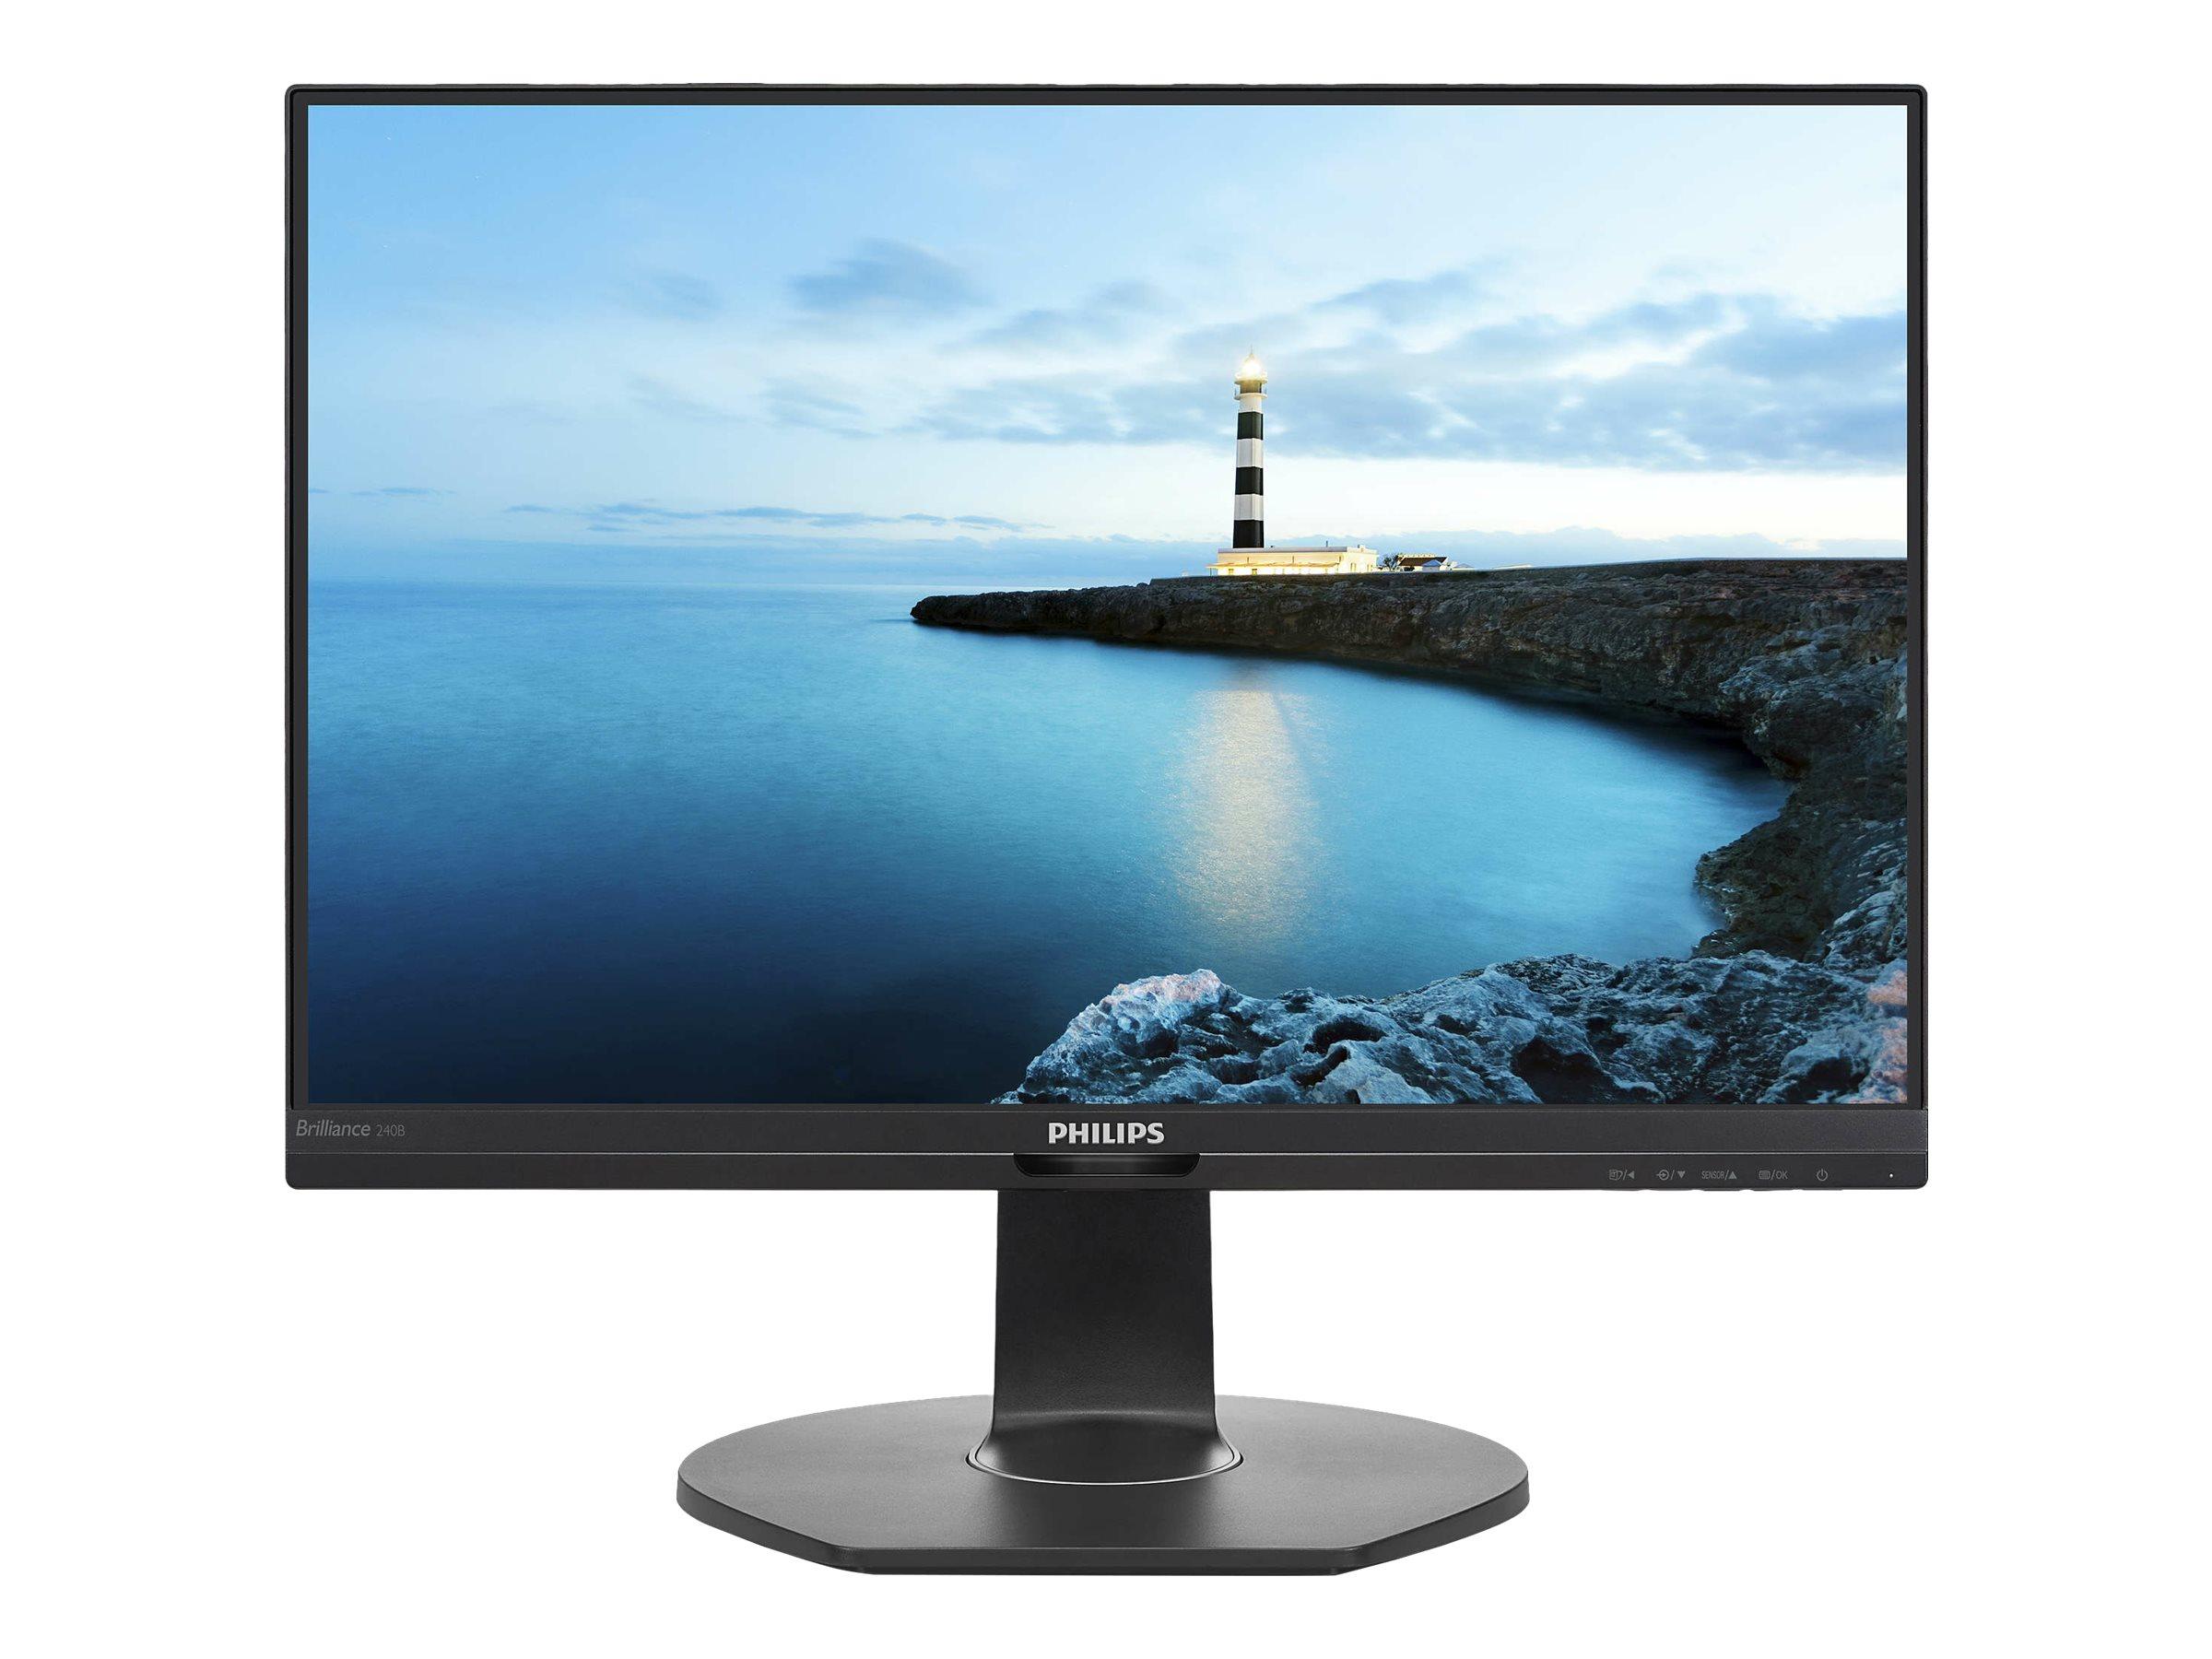 Philips Brilliance B-line 240B7QPJEB - LED-Monitor - 60 cm (24